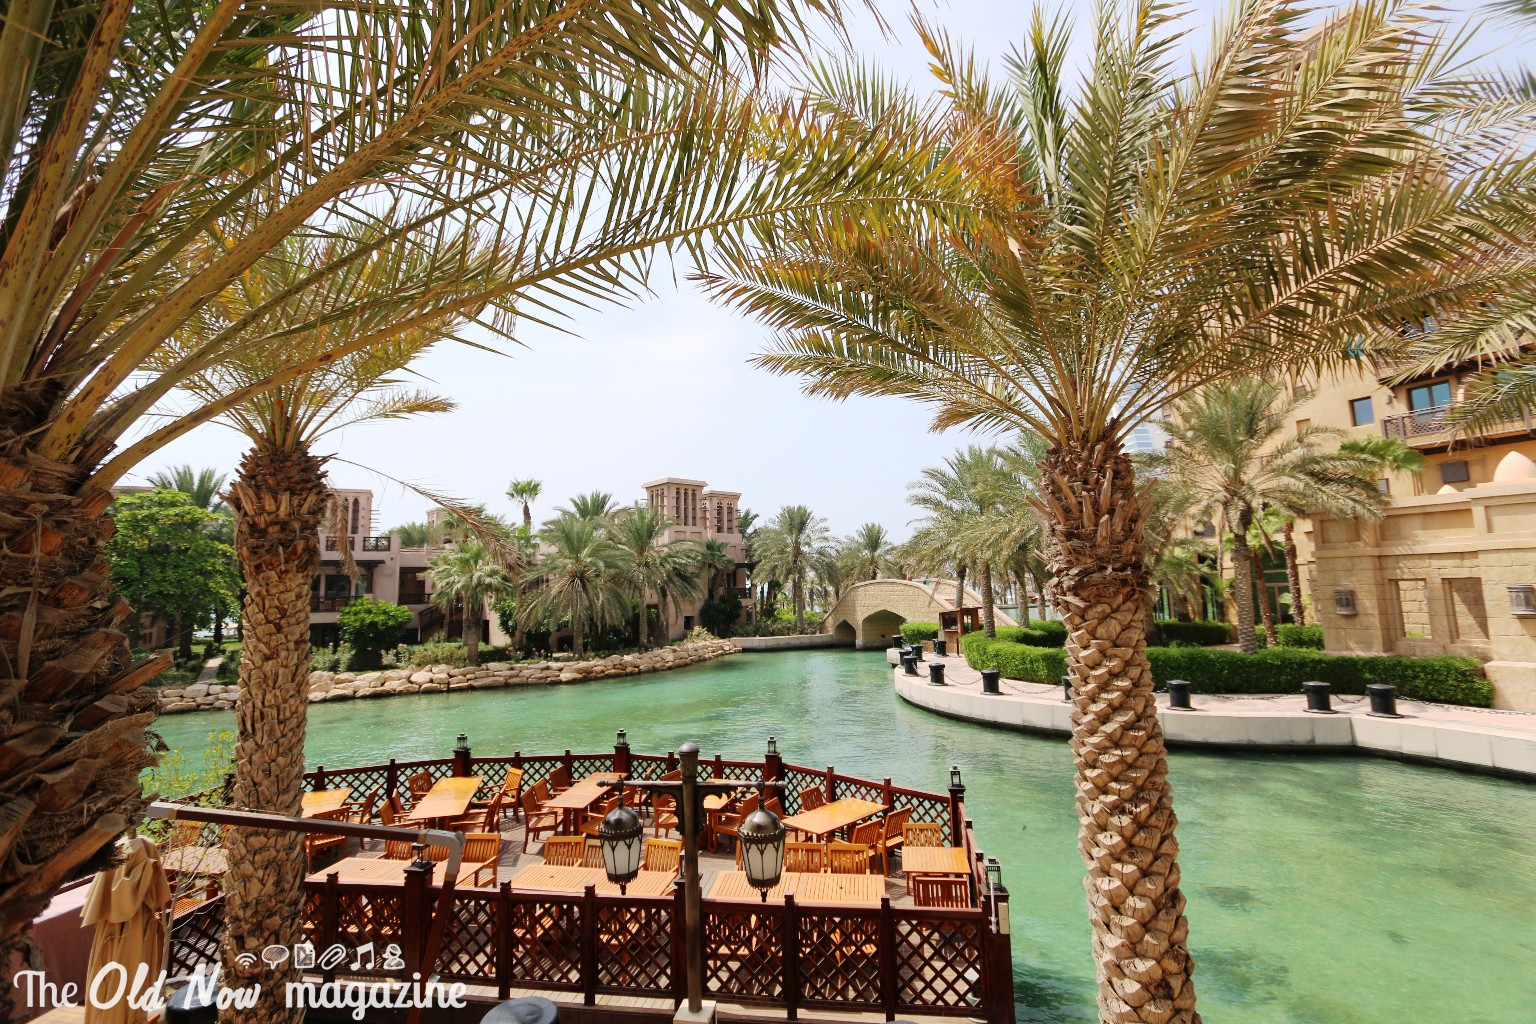 DUBAY DAY2 THEOLDNOW (33)